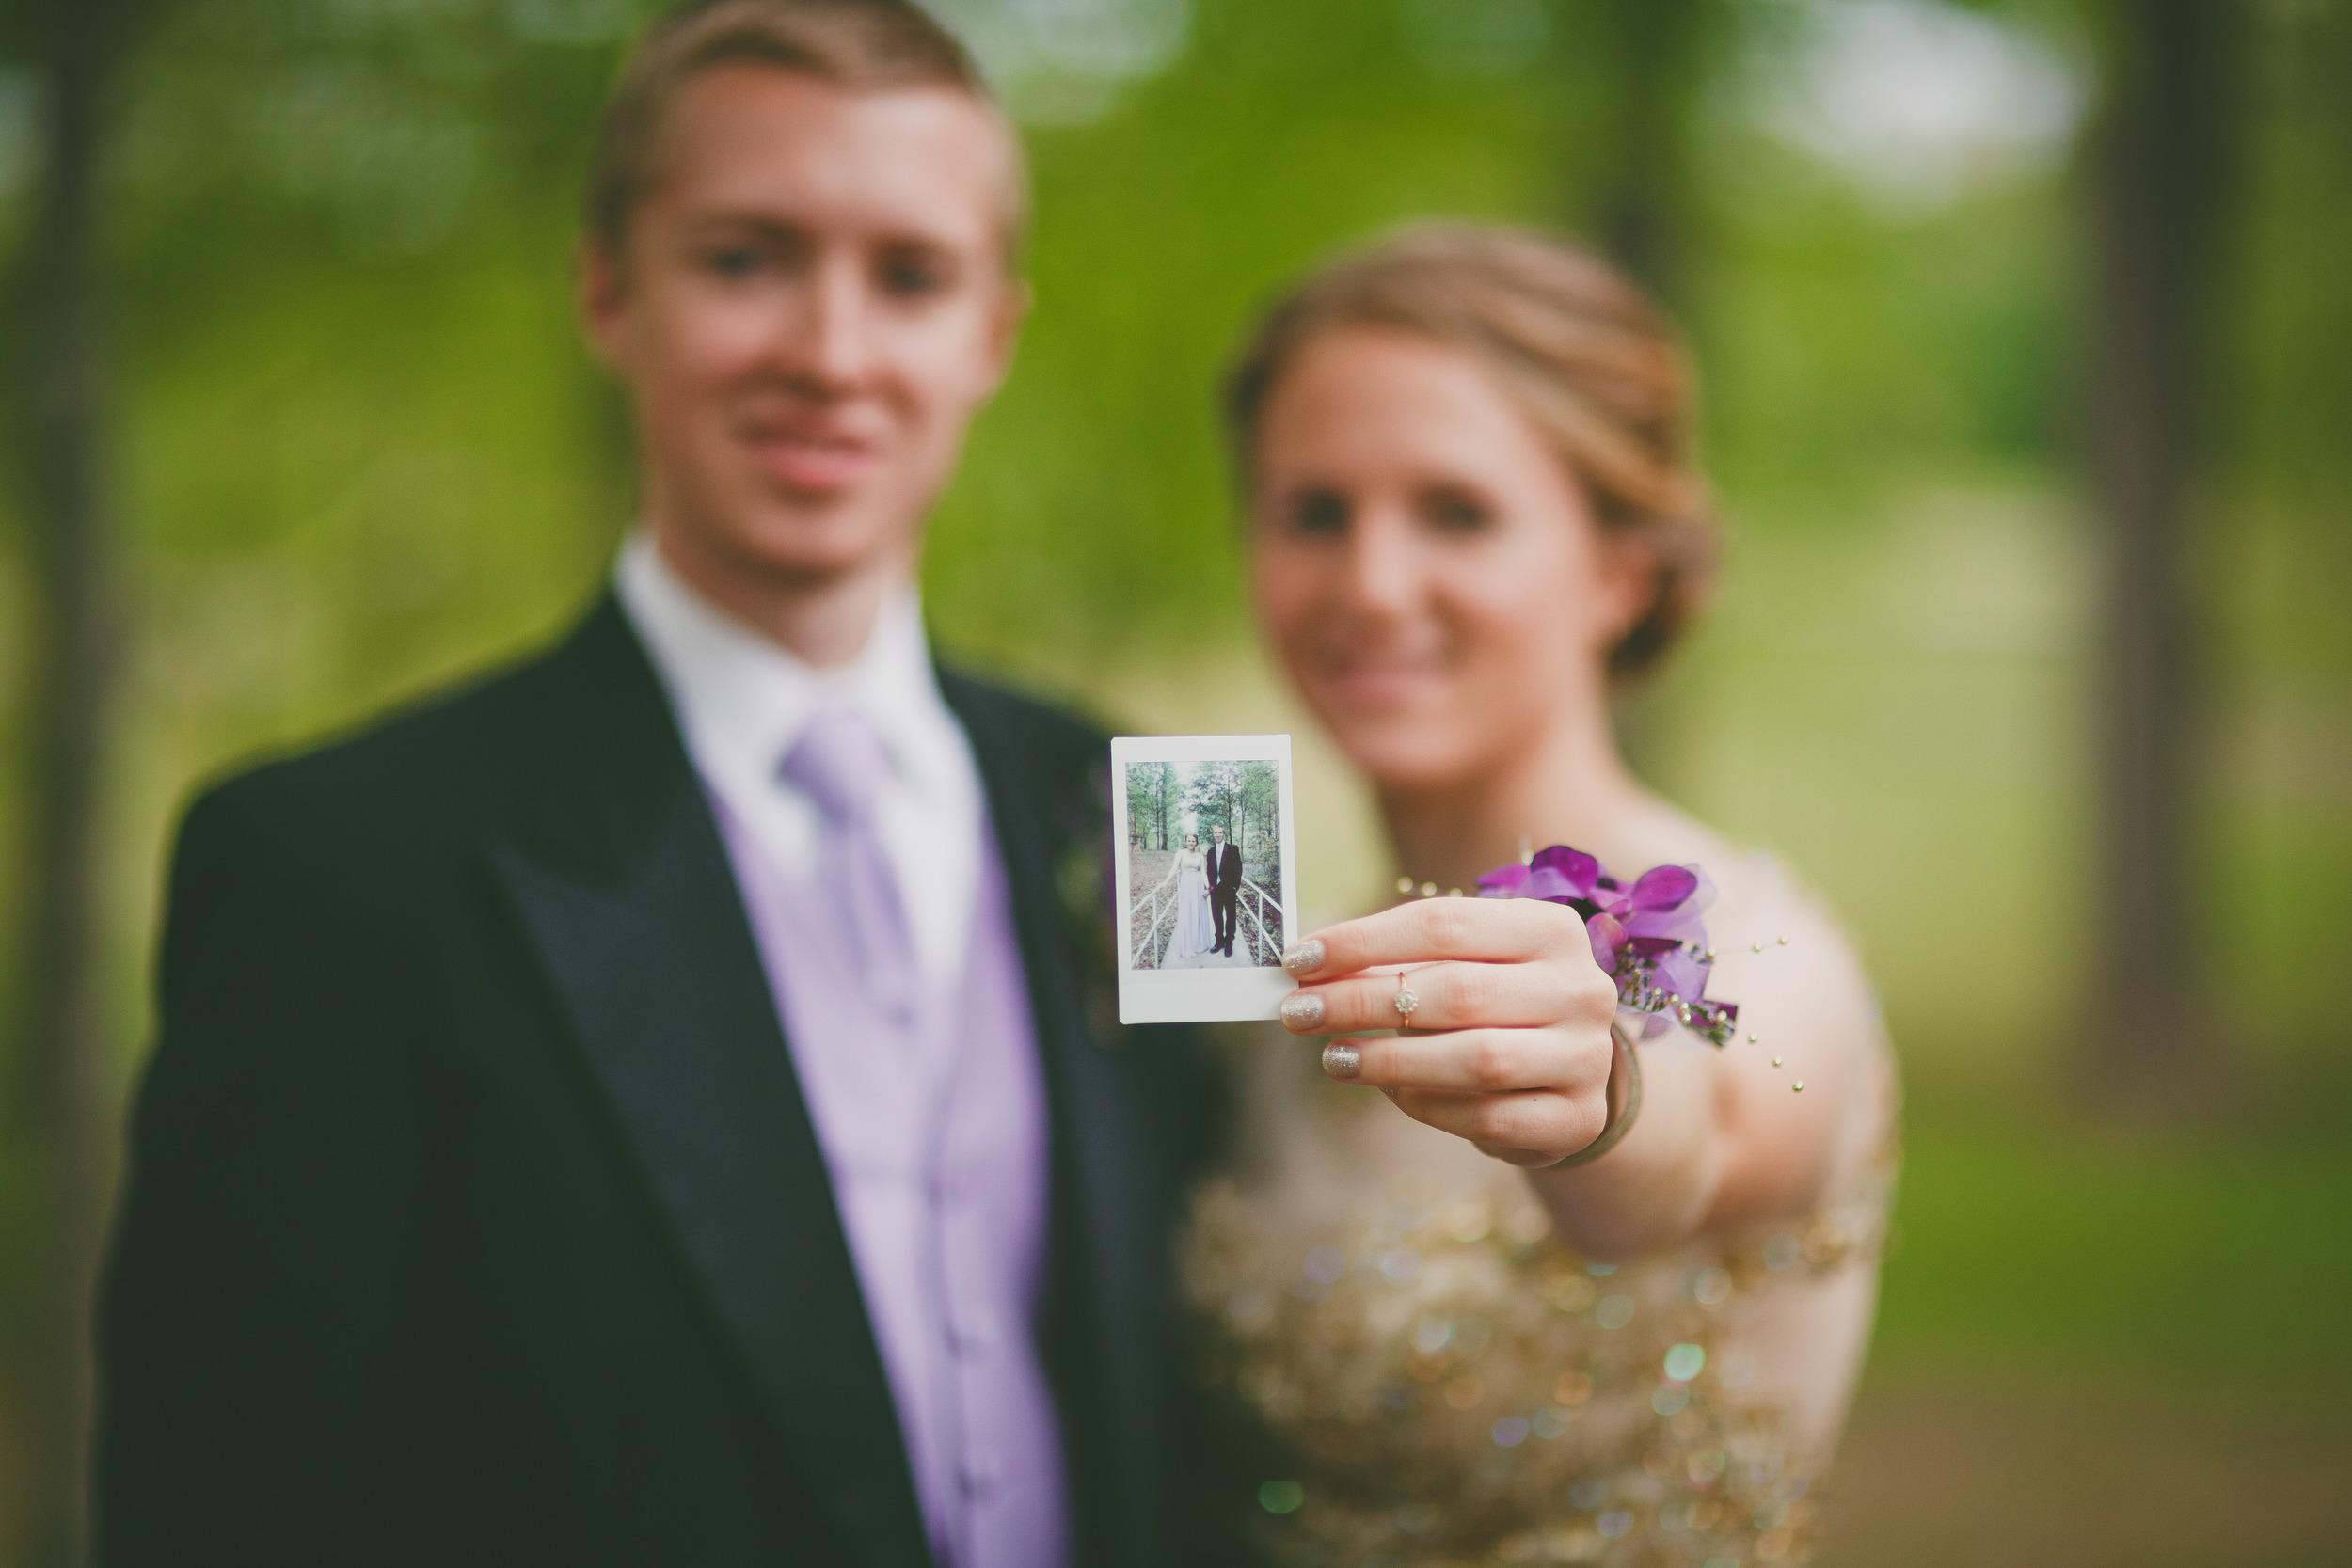 hanna and josh - greenbrier high school prom - springfield tn ...